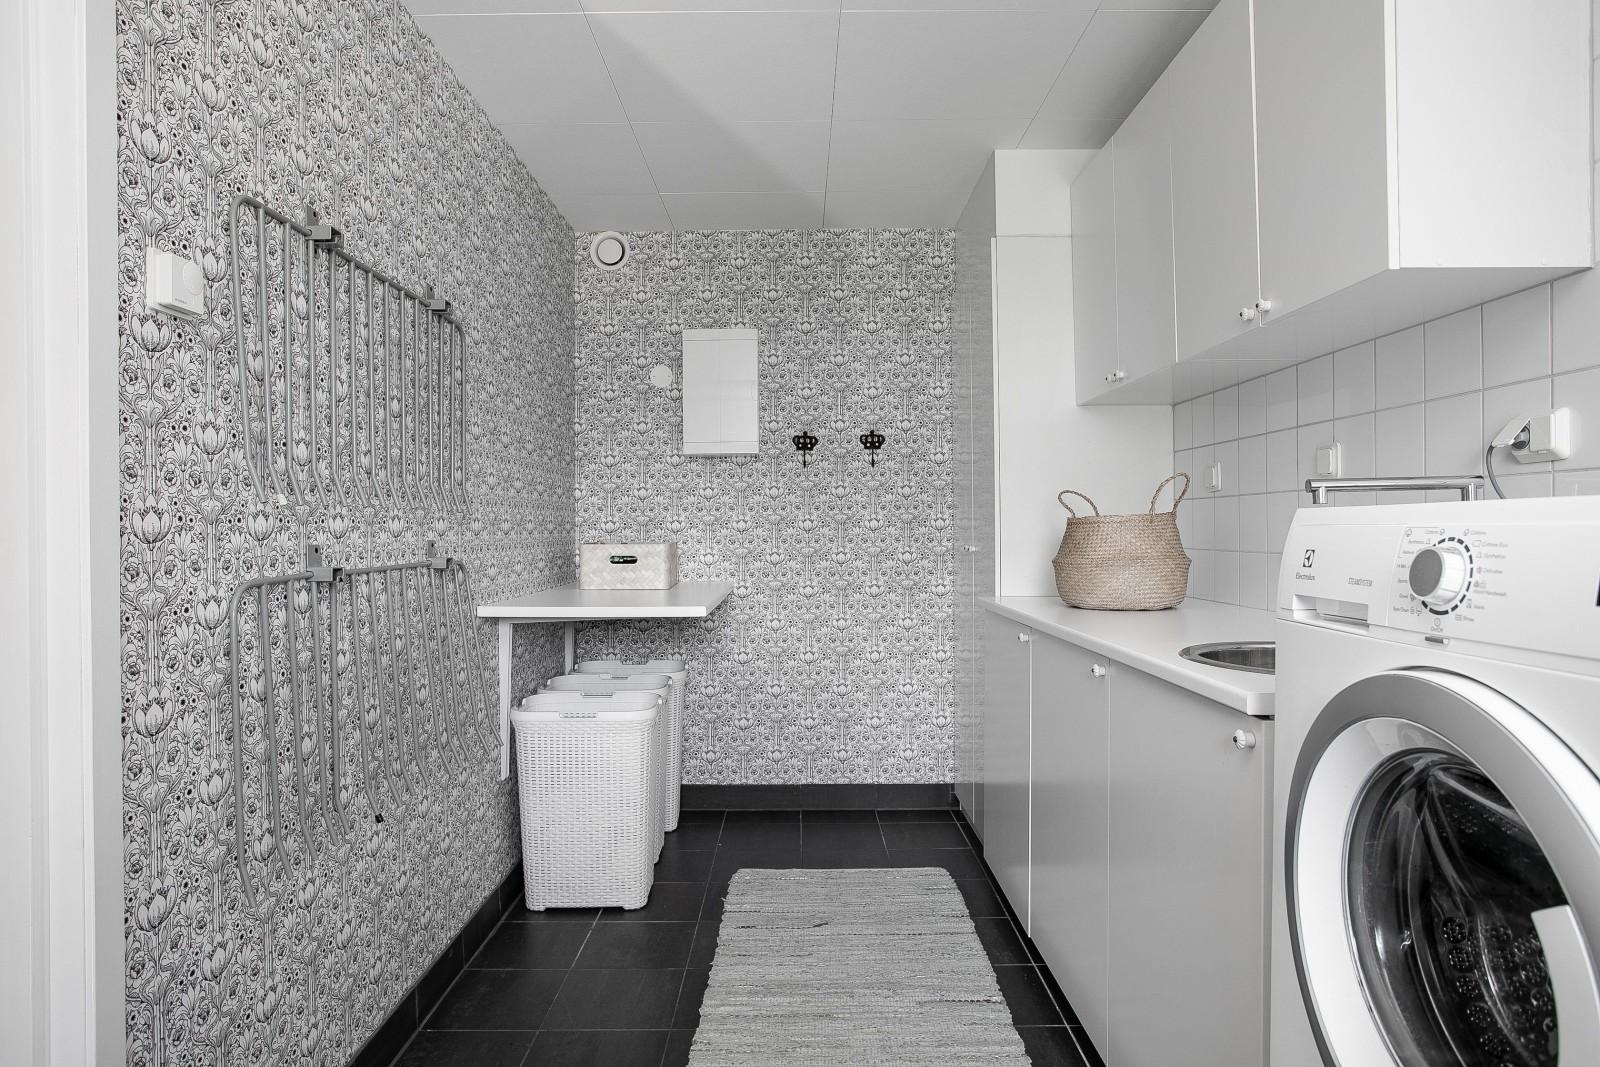 Tvätt - Groventré..